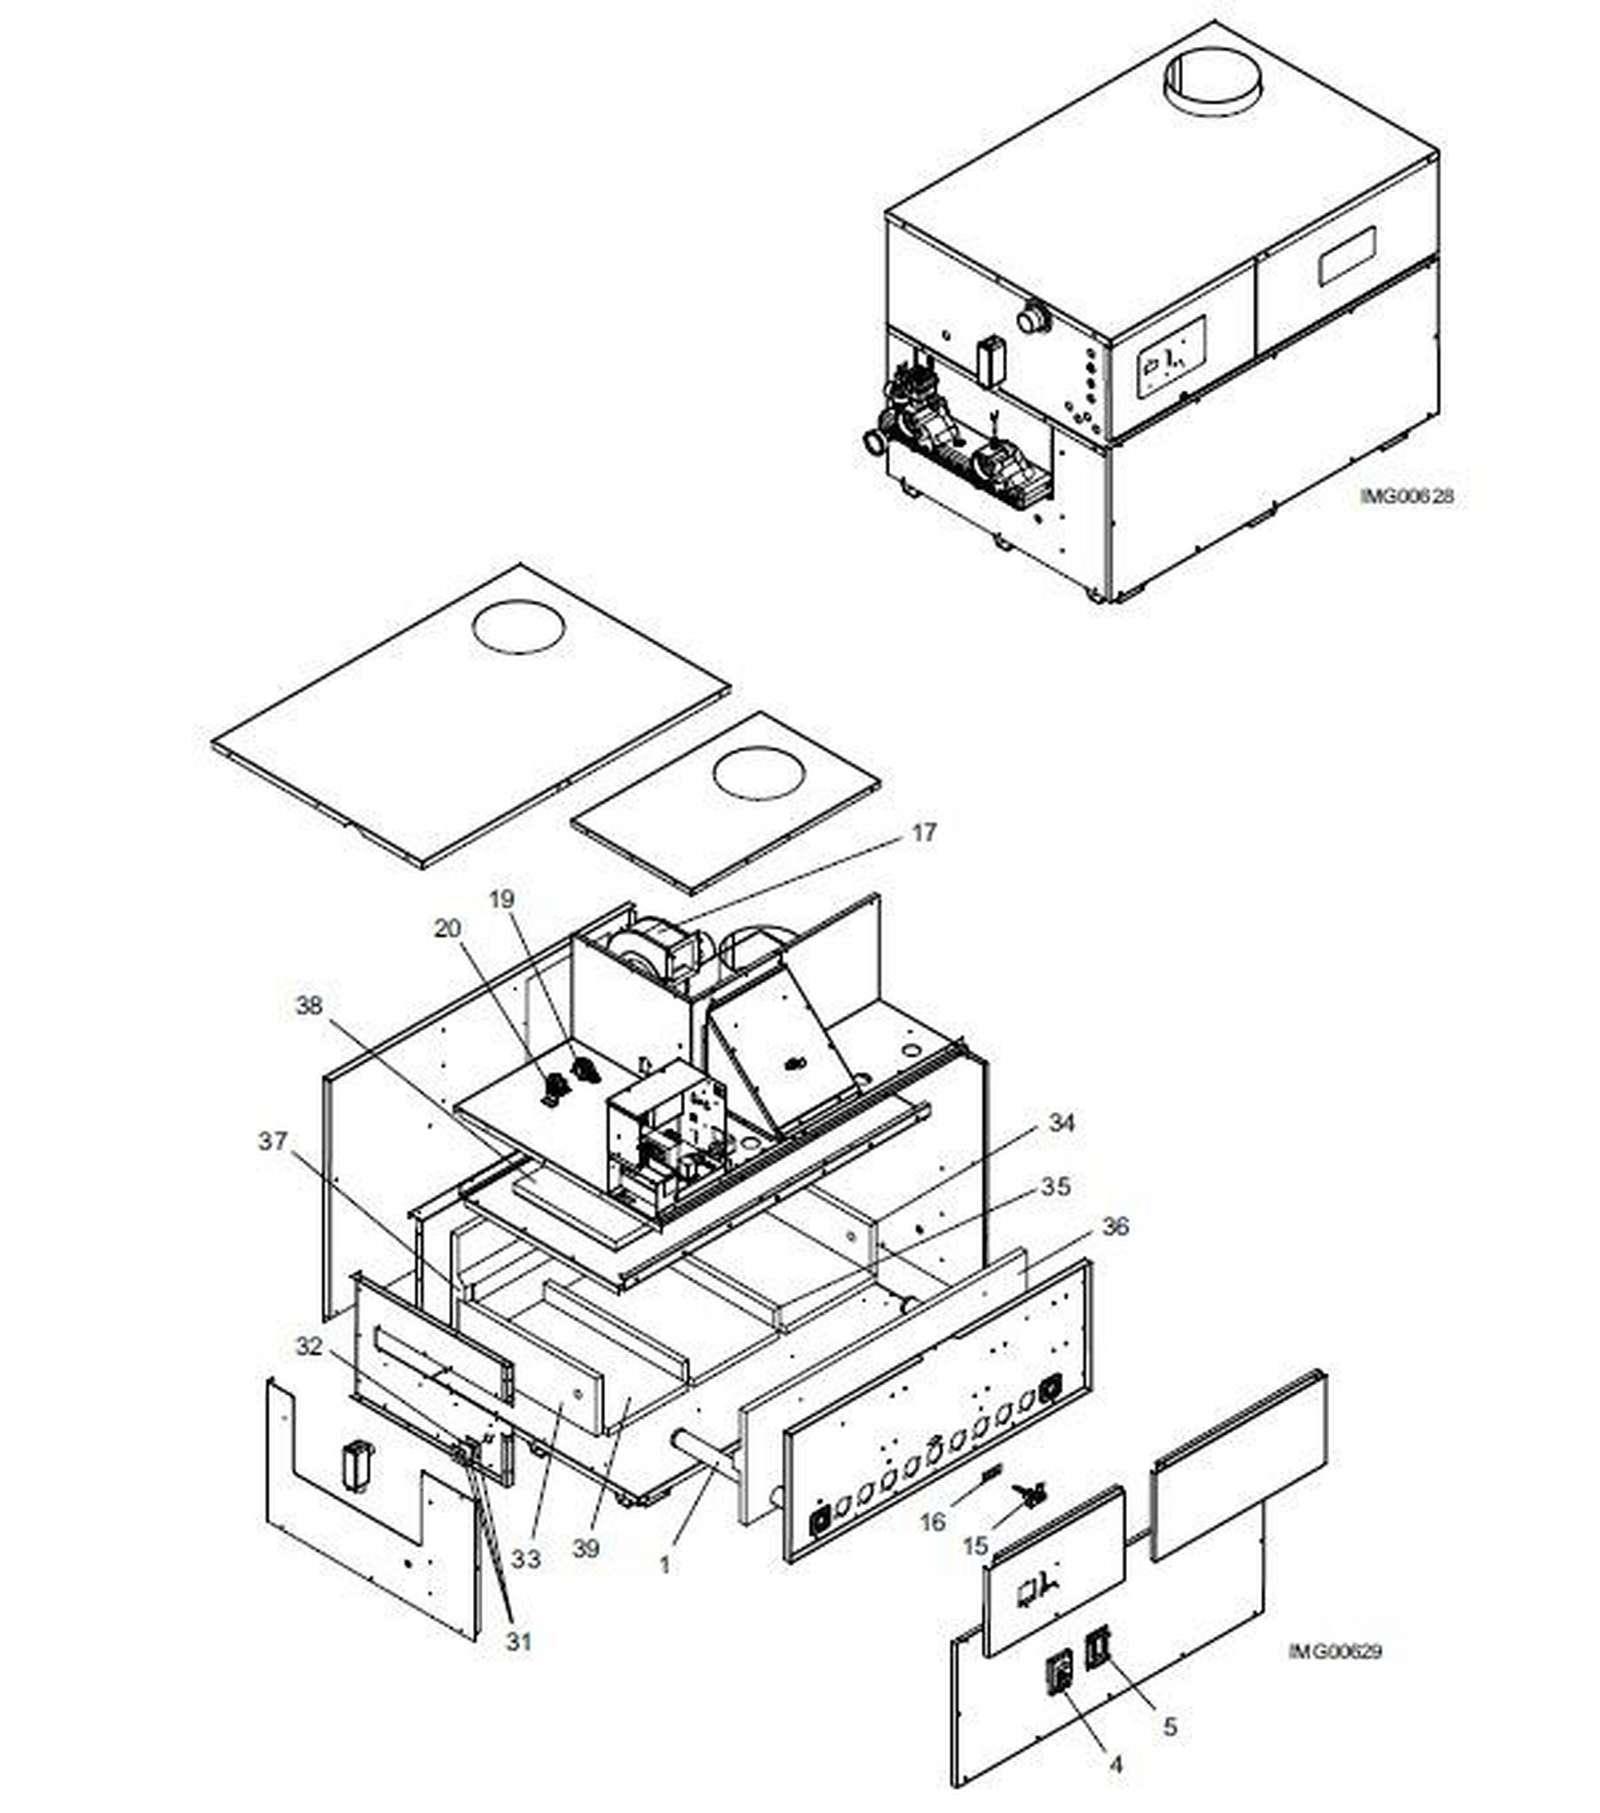 Dexter King Wiring Diagram. Battery Diagrams, Electronic